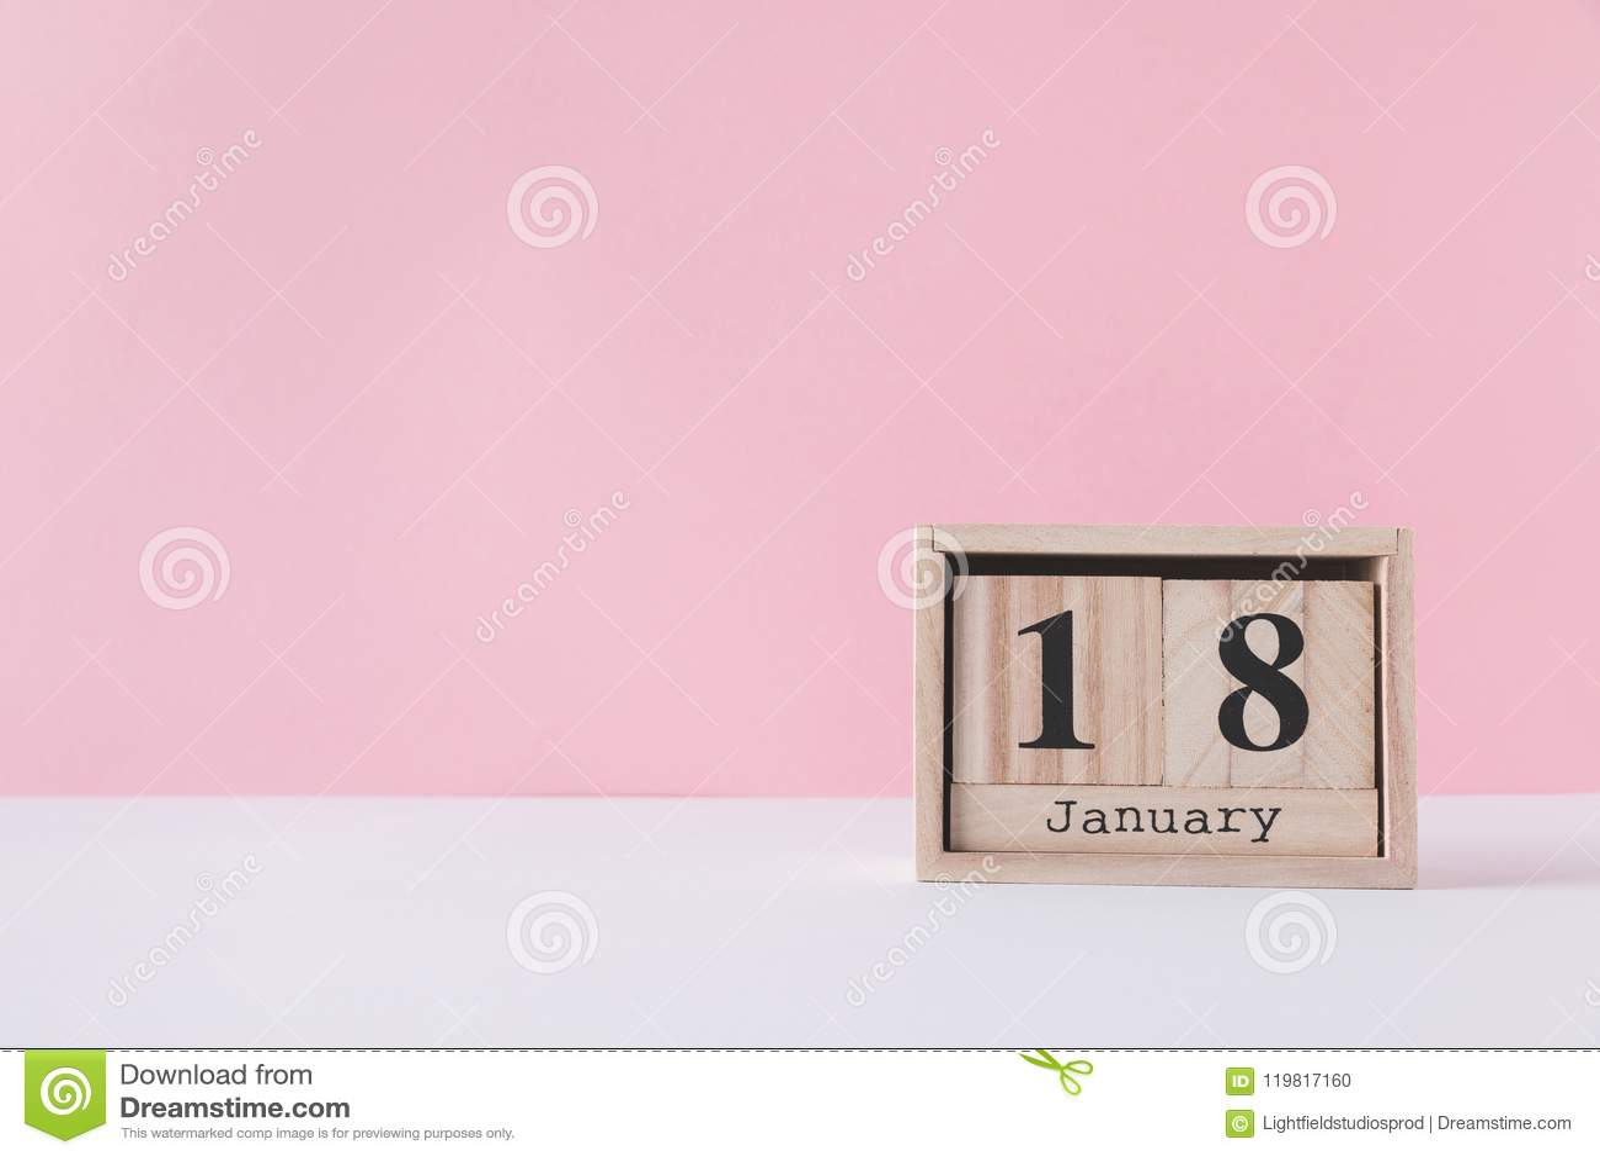 close up view of wooden calendar